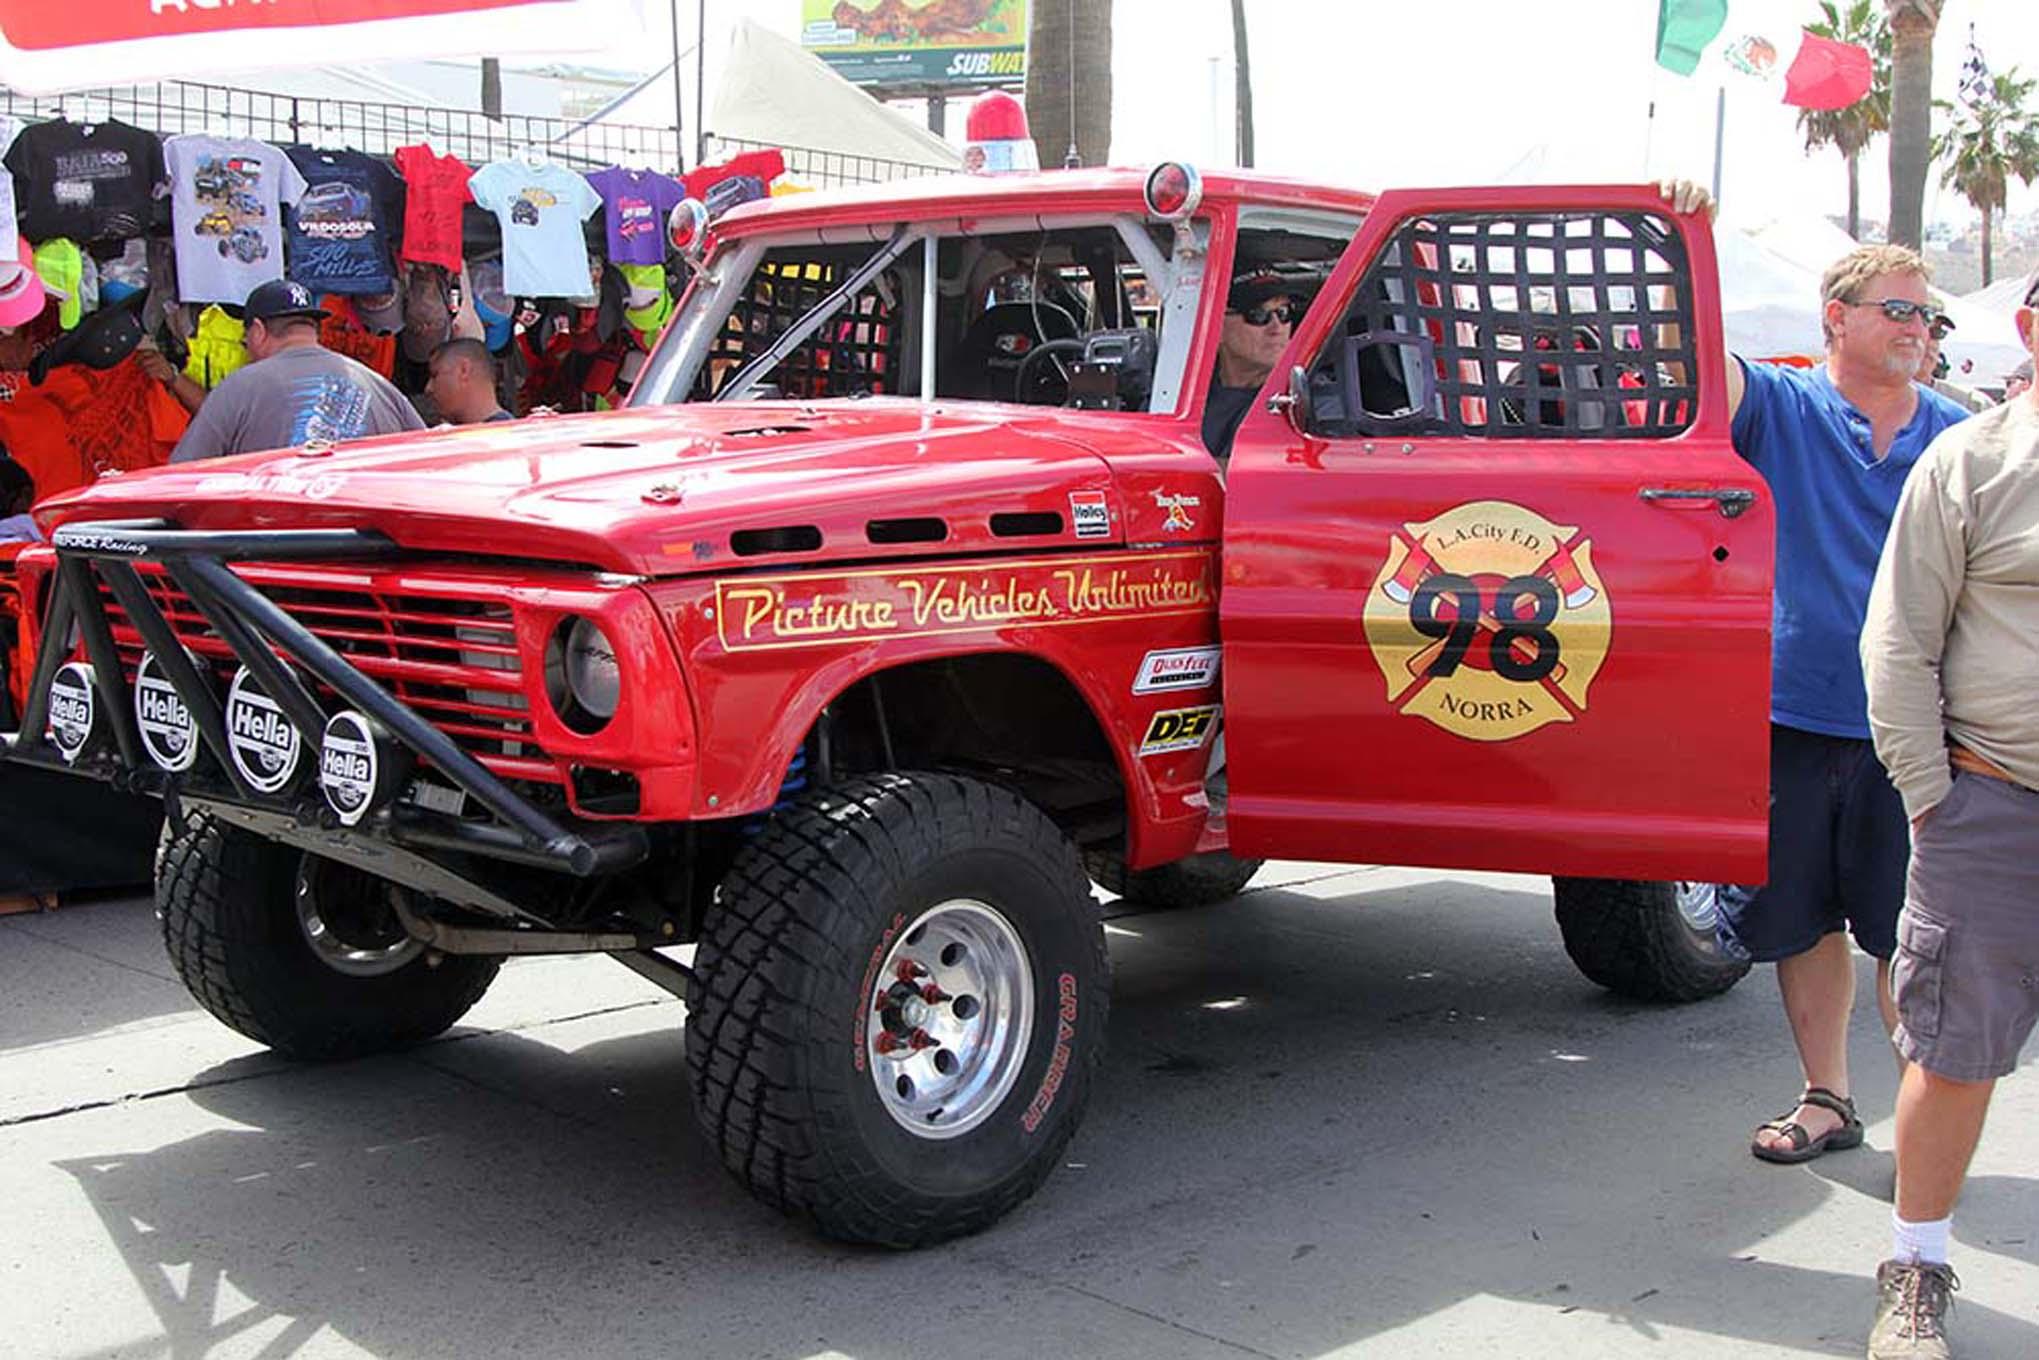 111NORRA Mexican 1000 BAJA offroad Race 2015 Manx Nova Chevy James Garner